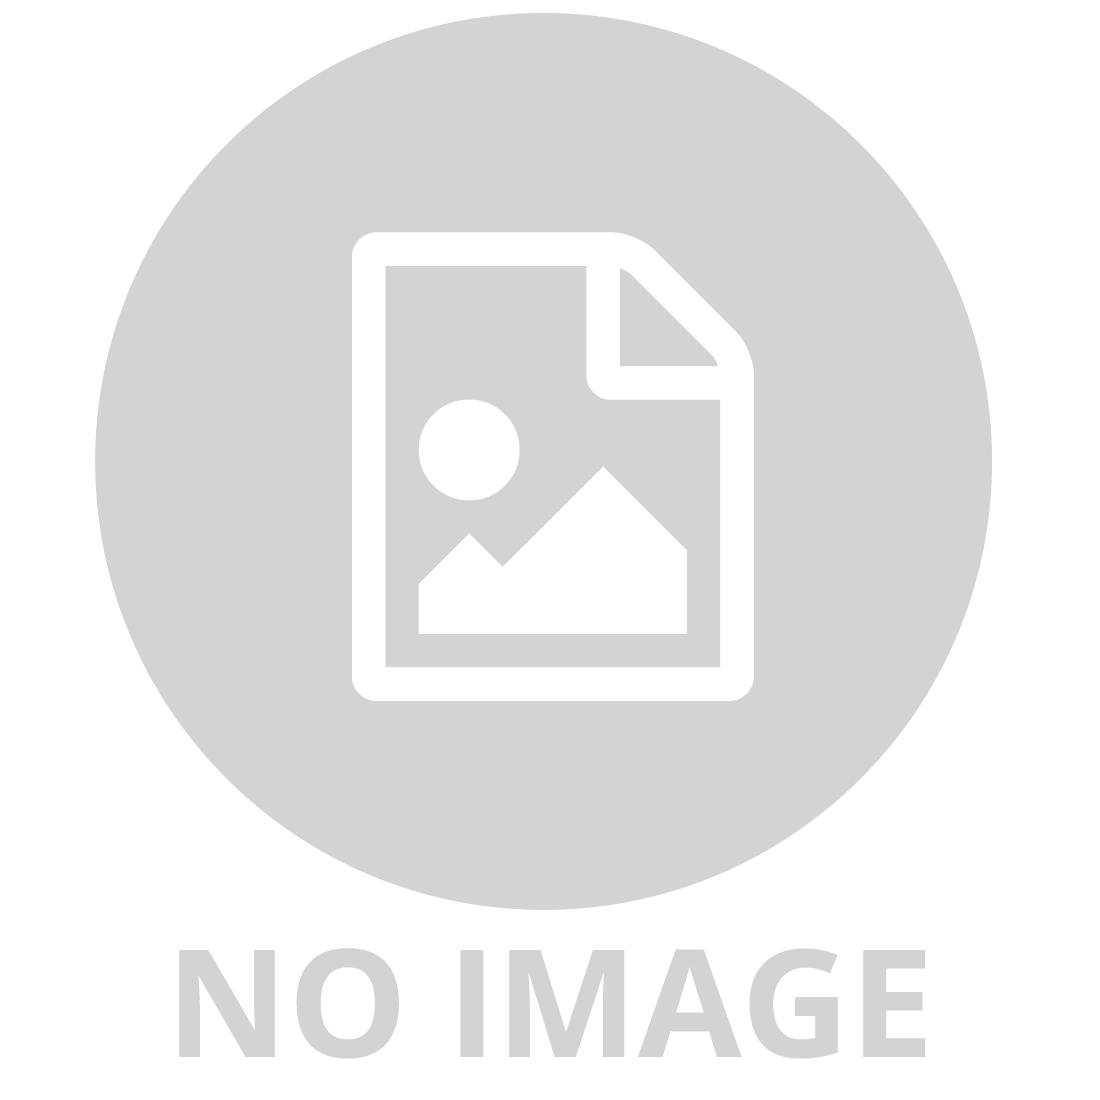 LEGO DC SUPER HEROES 76095 AQUAMAN BLACK MANTA STRIKE